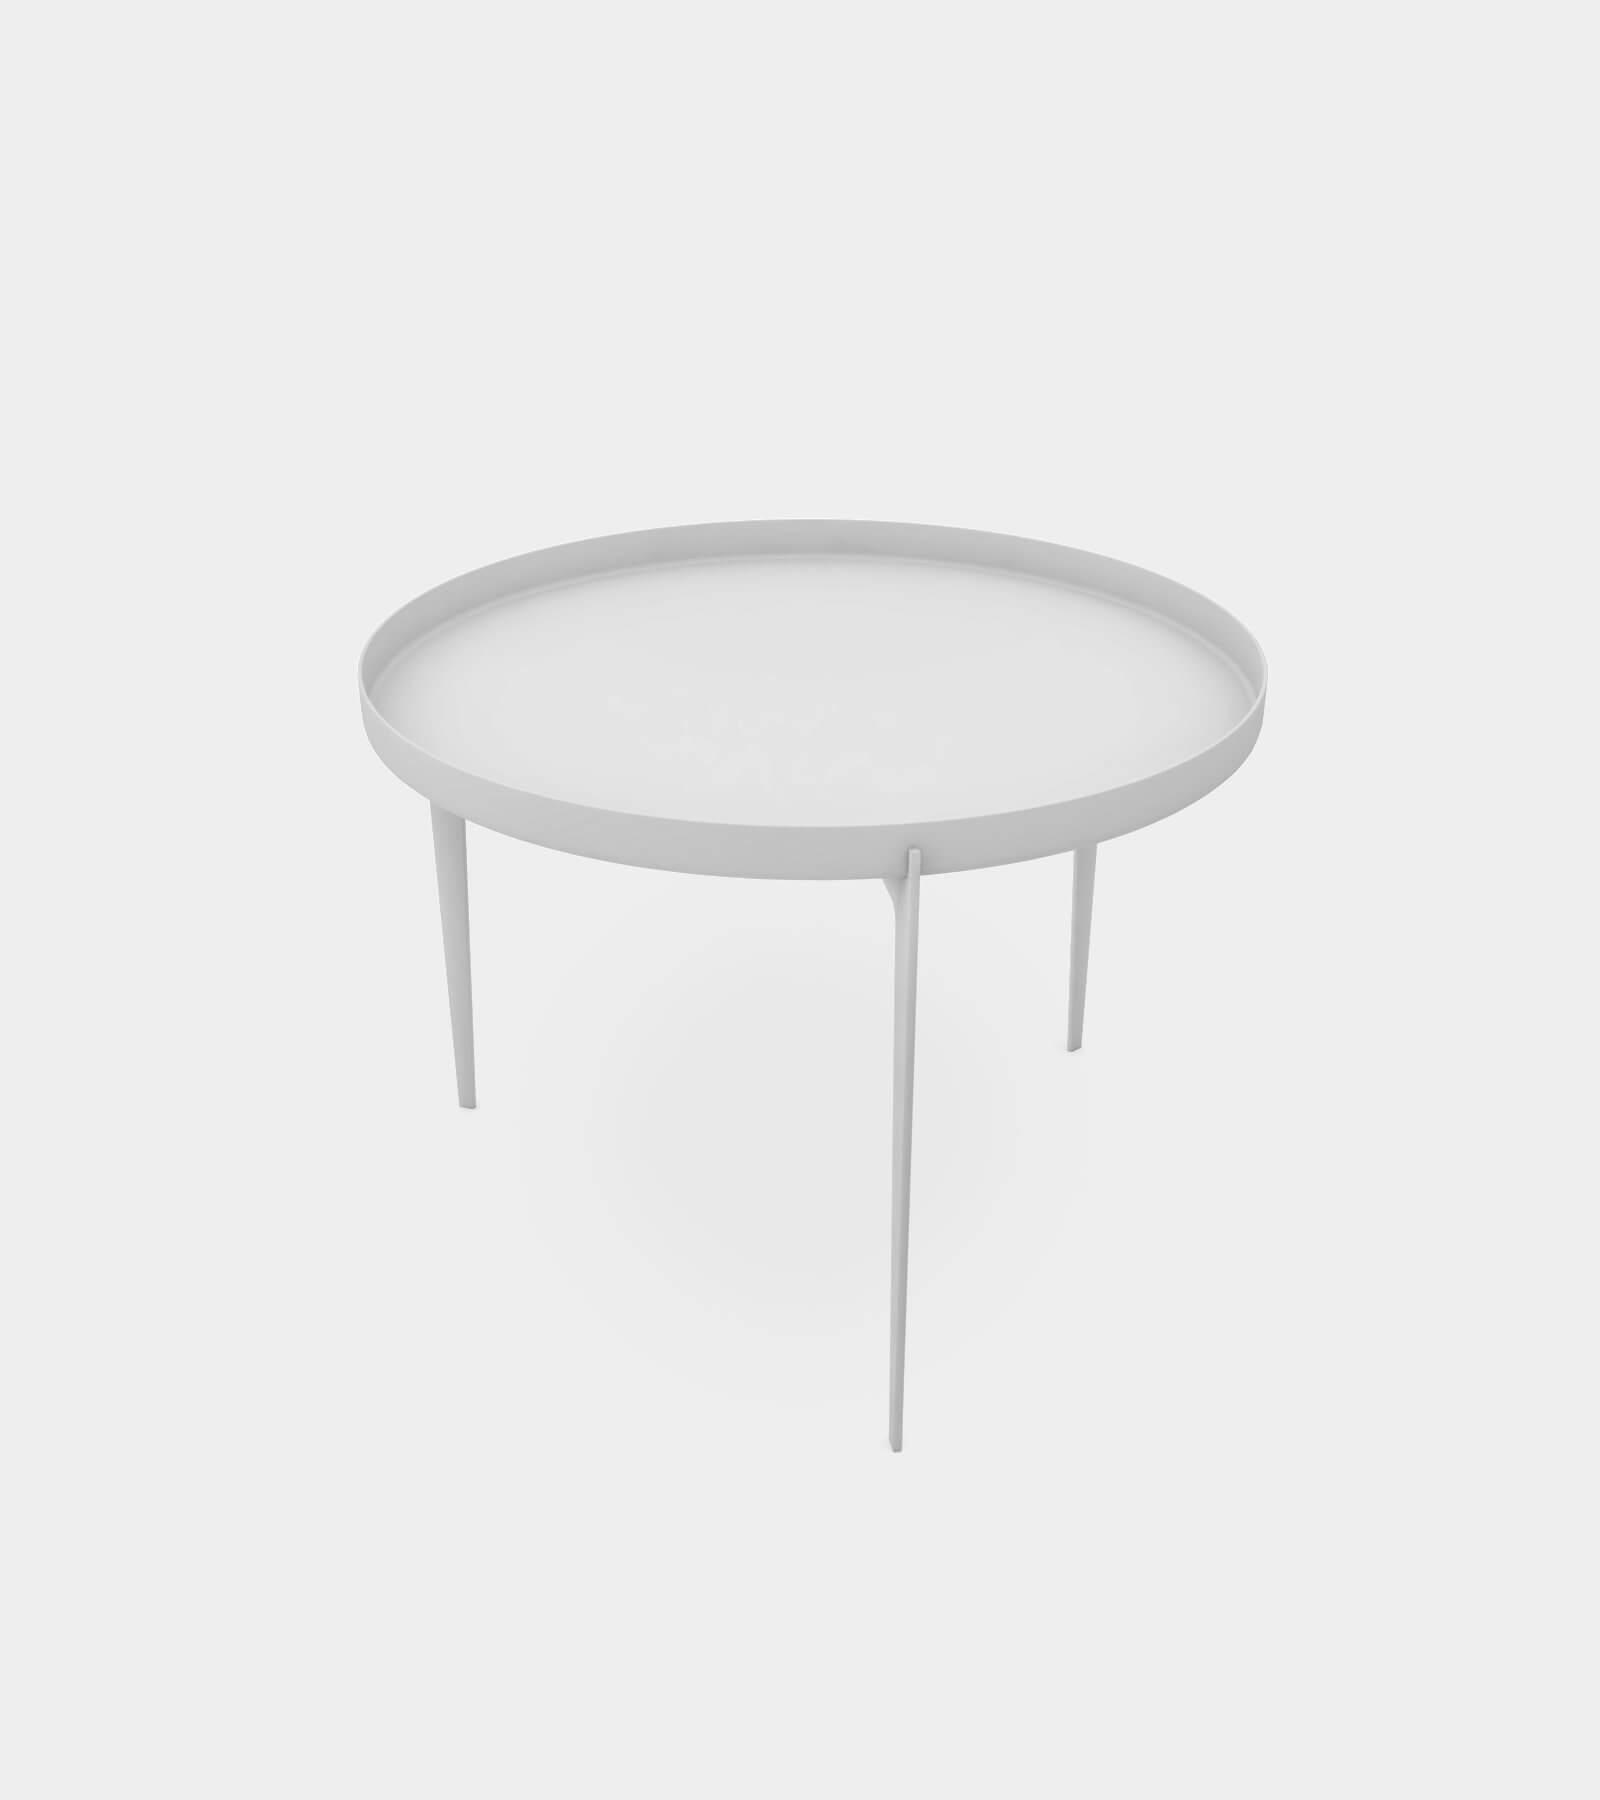 Modern metal coffee table 1 - 3D Model